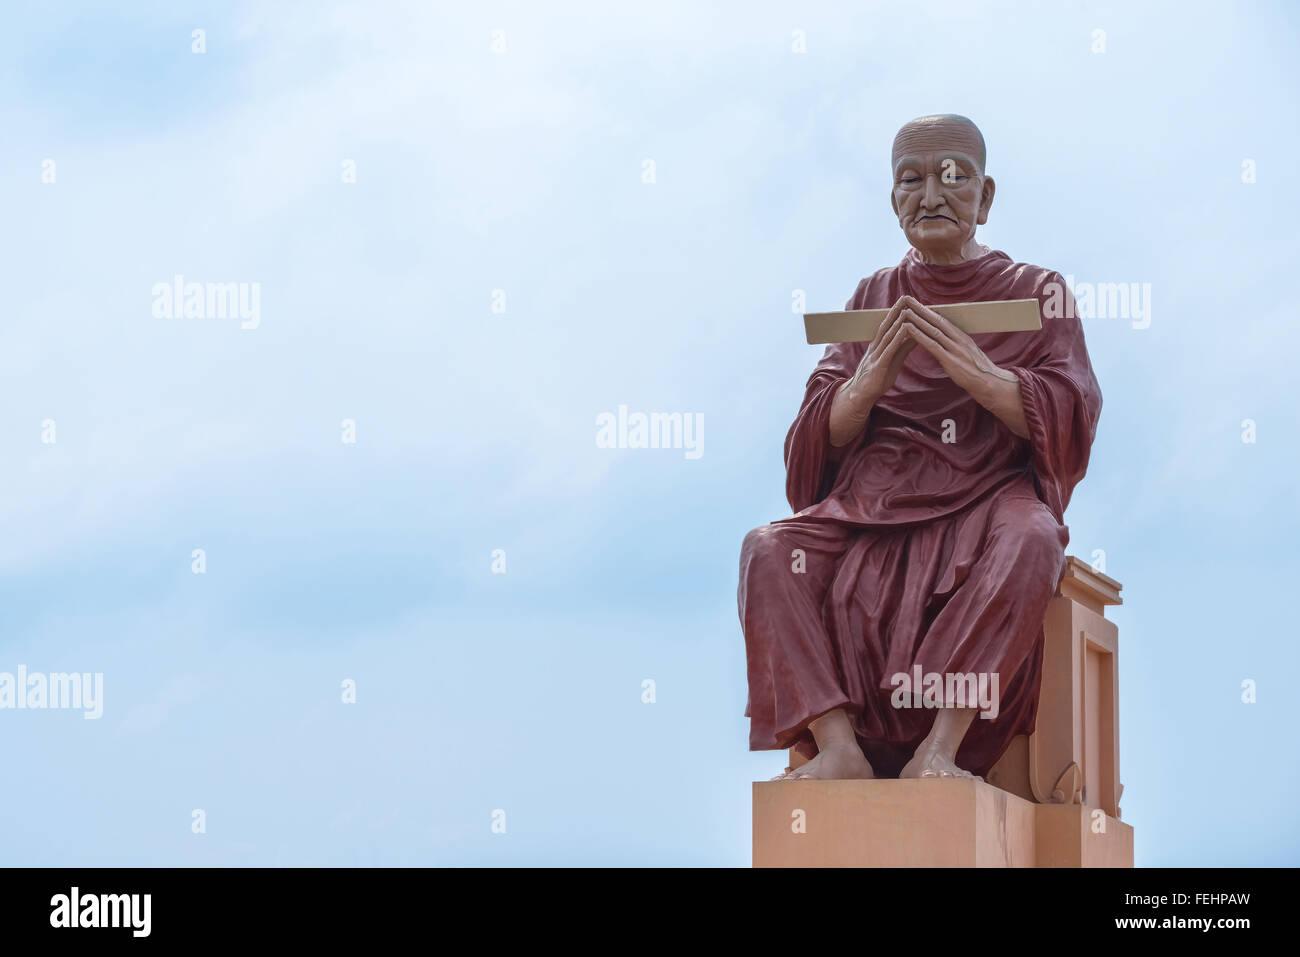 monk statue of buddhist recite scriptures - Stock Image